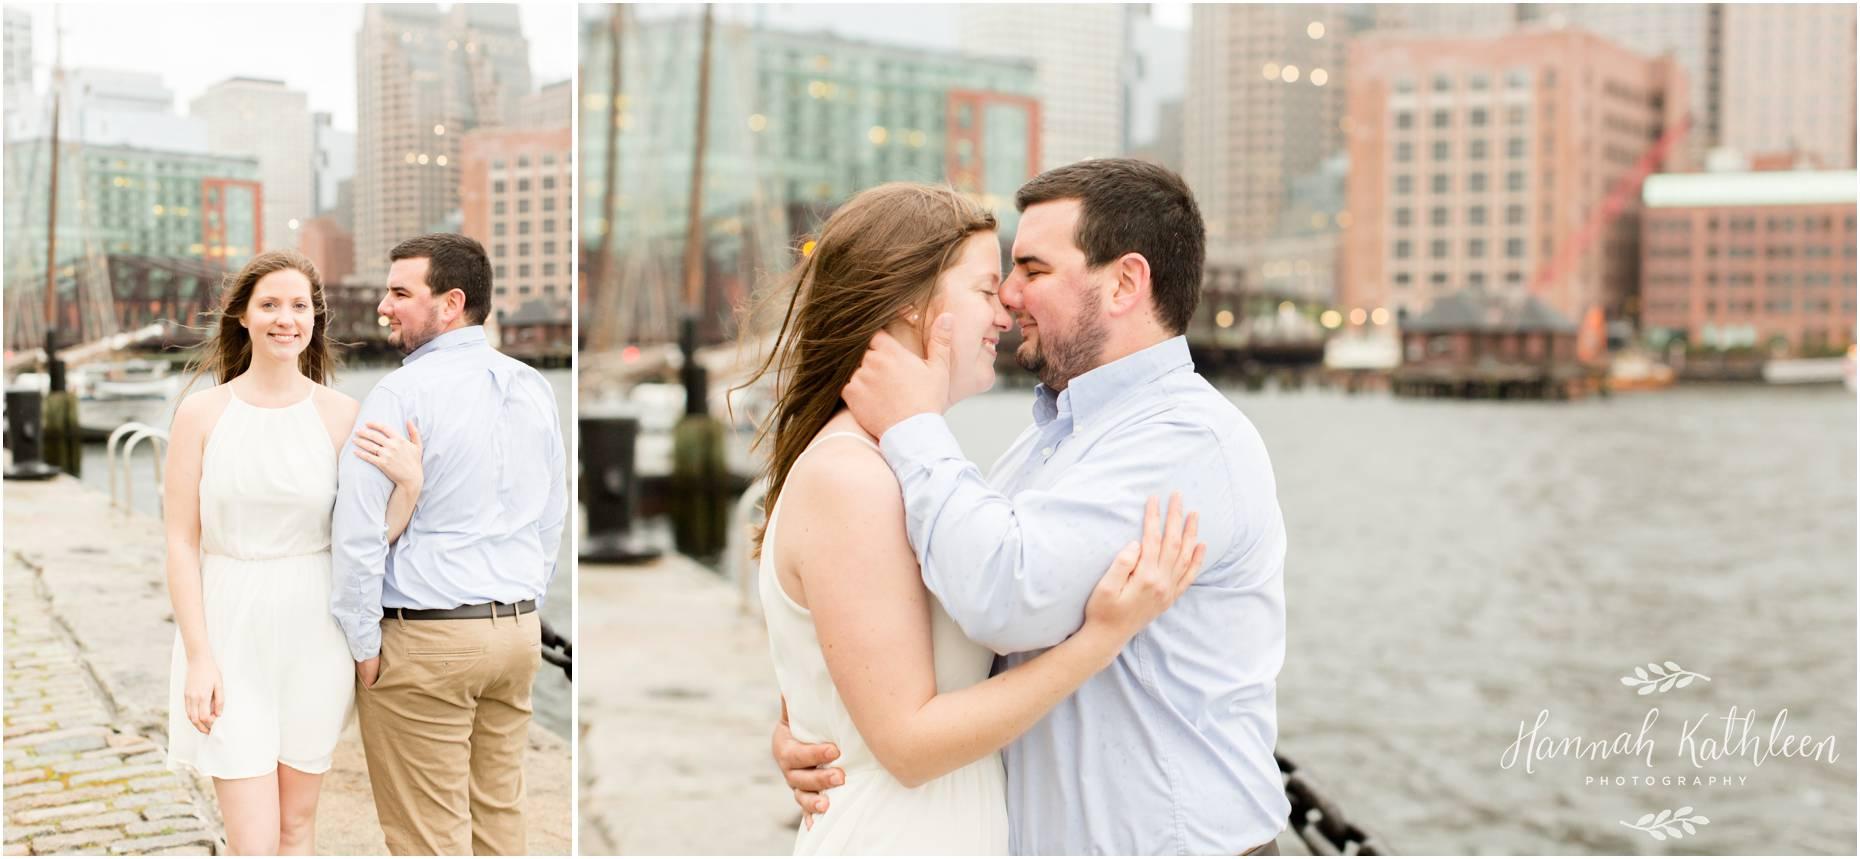 RayNicole_Boston_Engagement_Photographer_0001.jpg